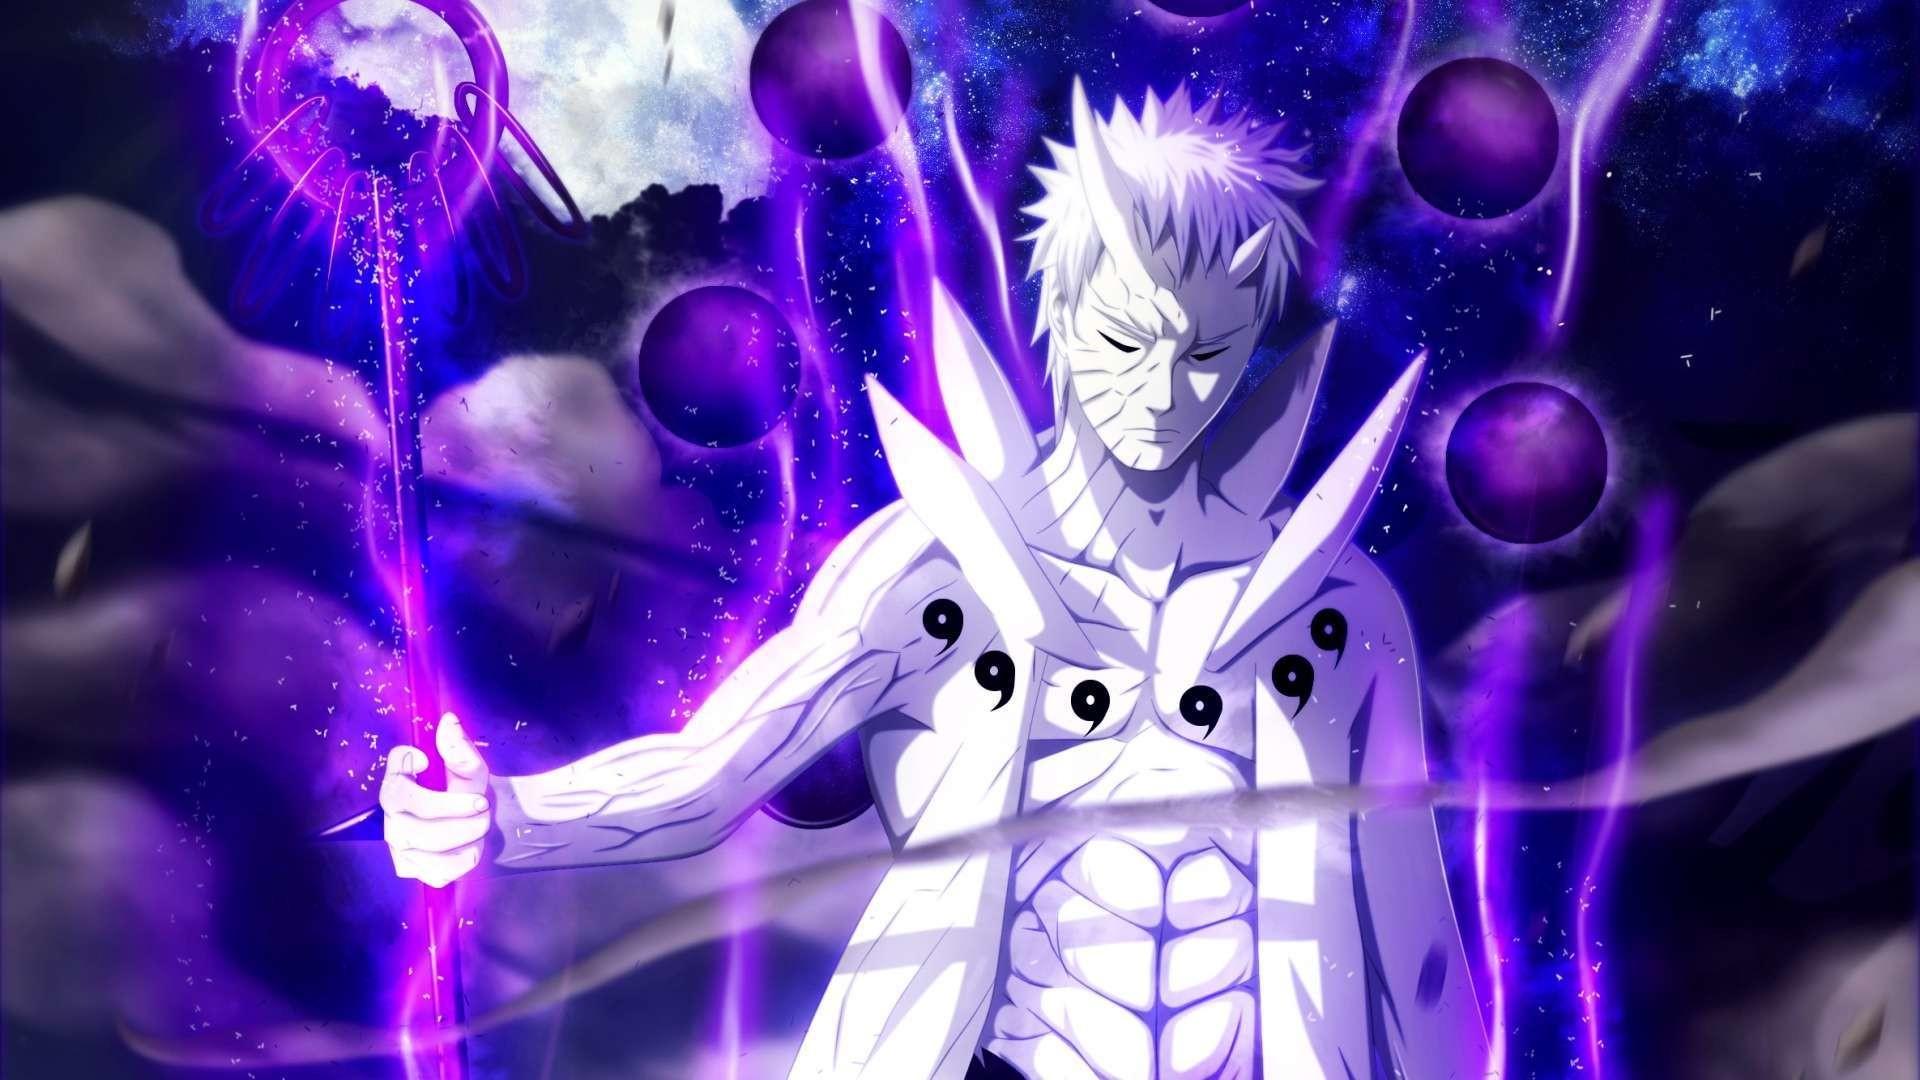 Download now: Anime Naruto Tobi Uchiha Obito Desktop Wallpaper 1080p .